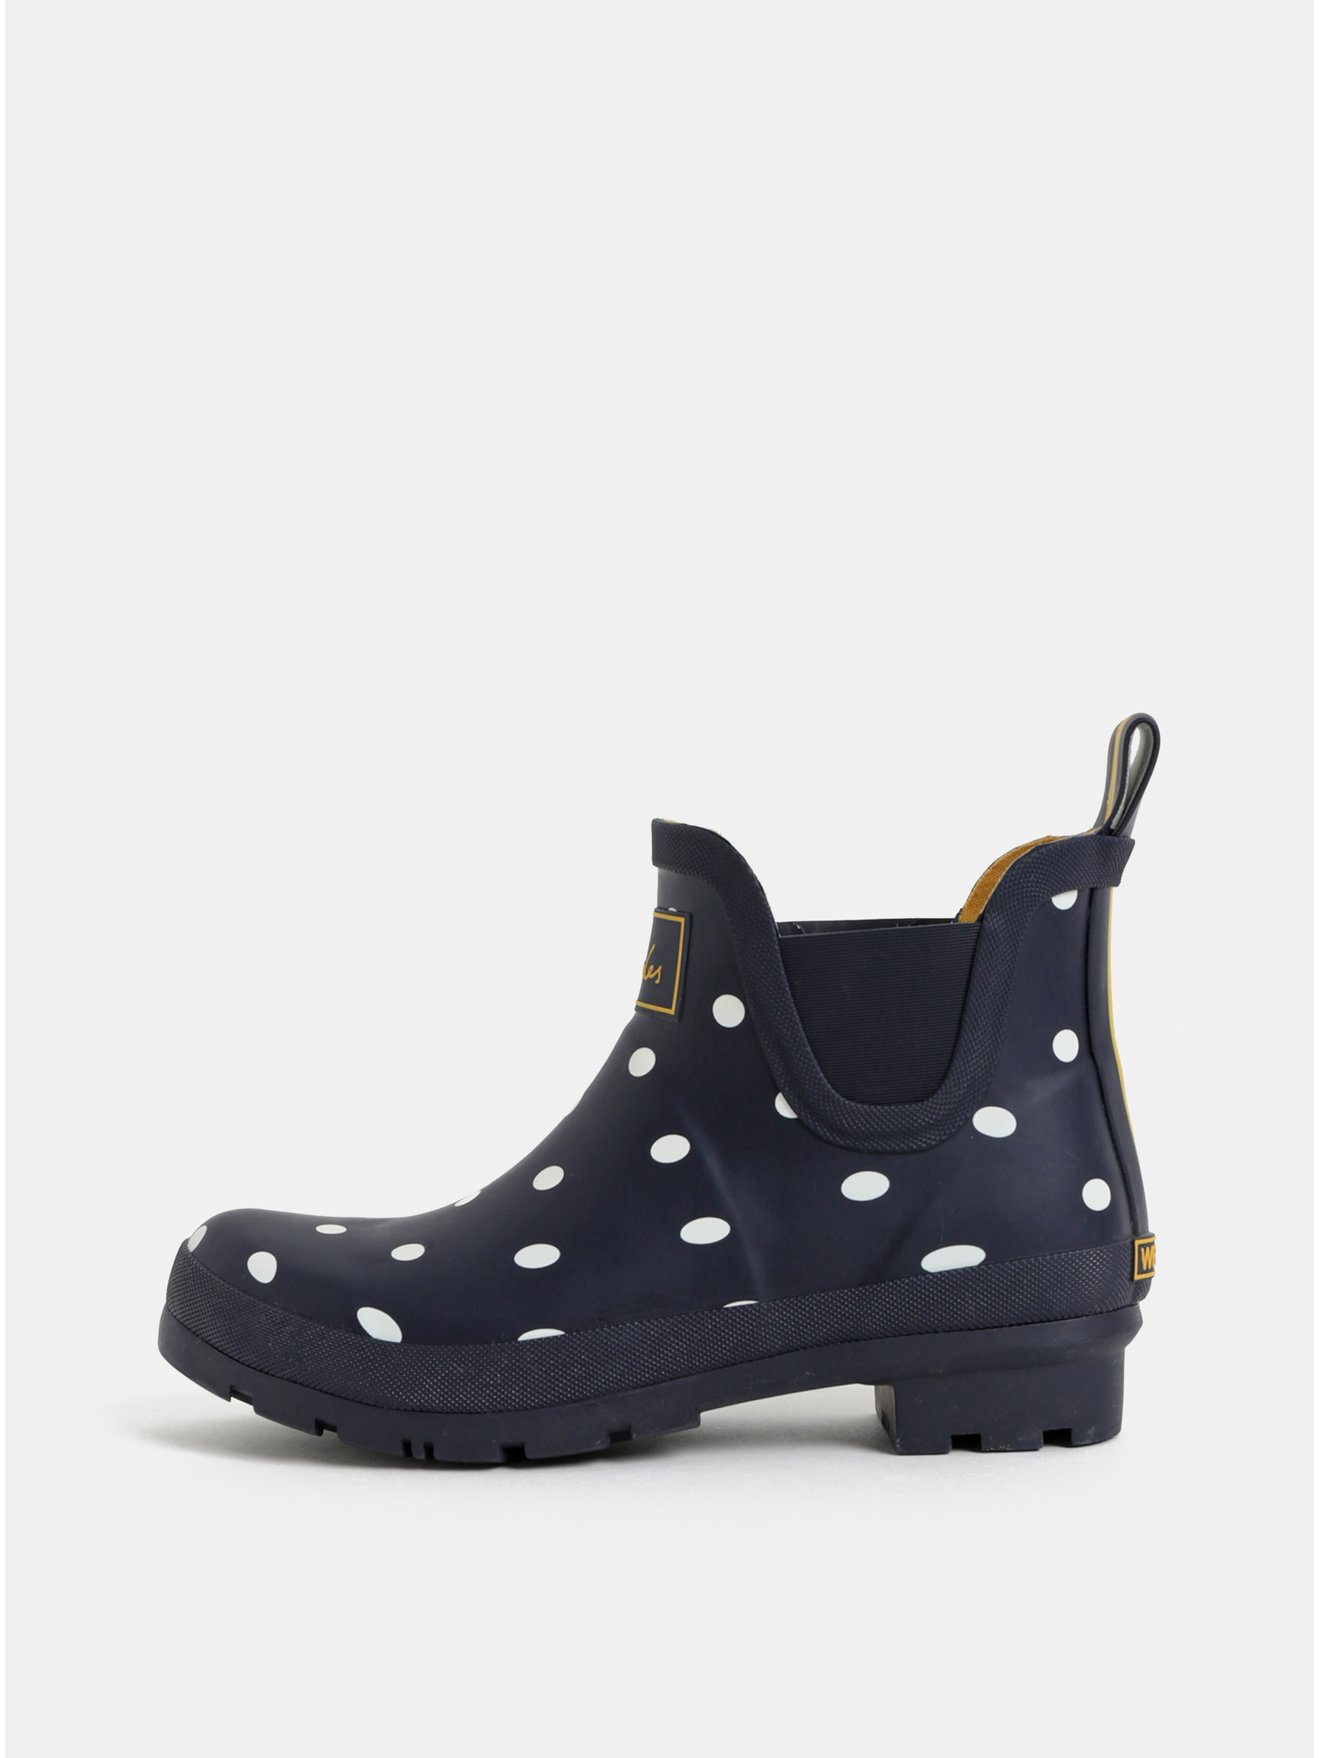 Tmavě modré dámské puntíkované gumové chelsea boty Tom Joule Wellibobs